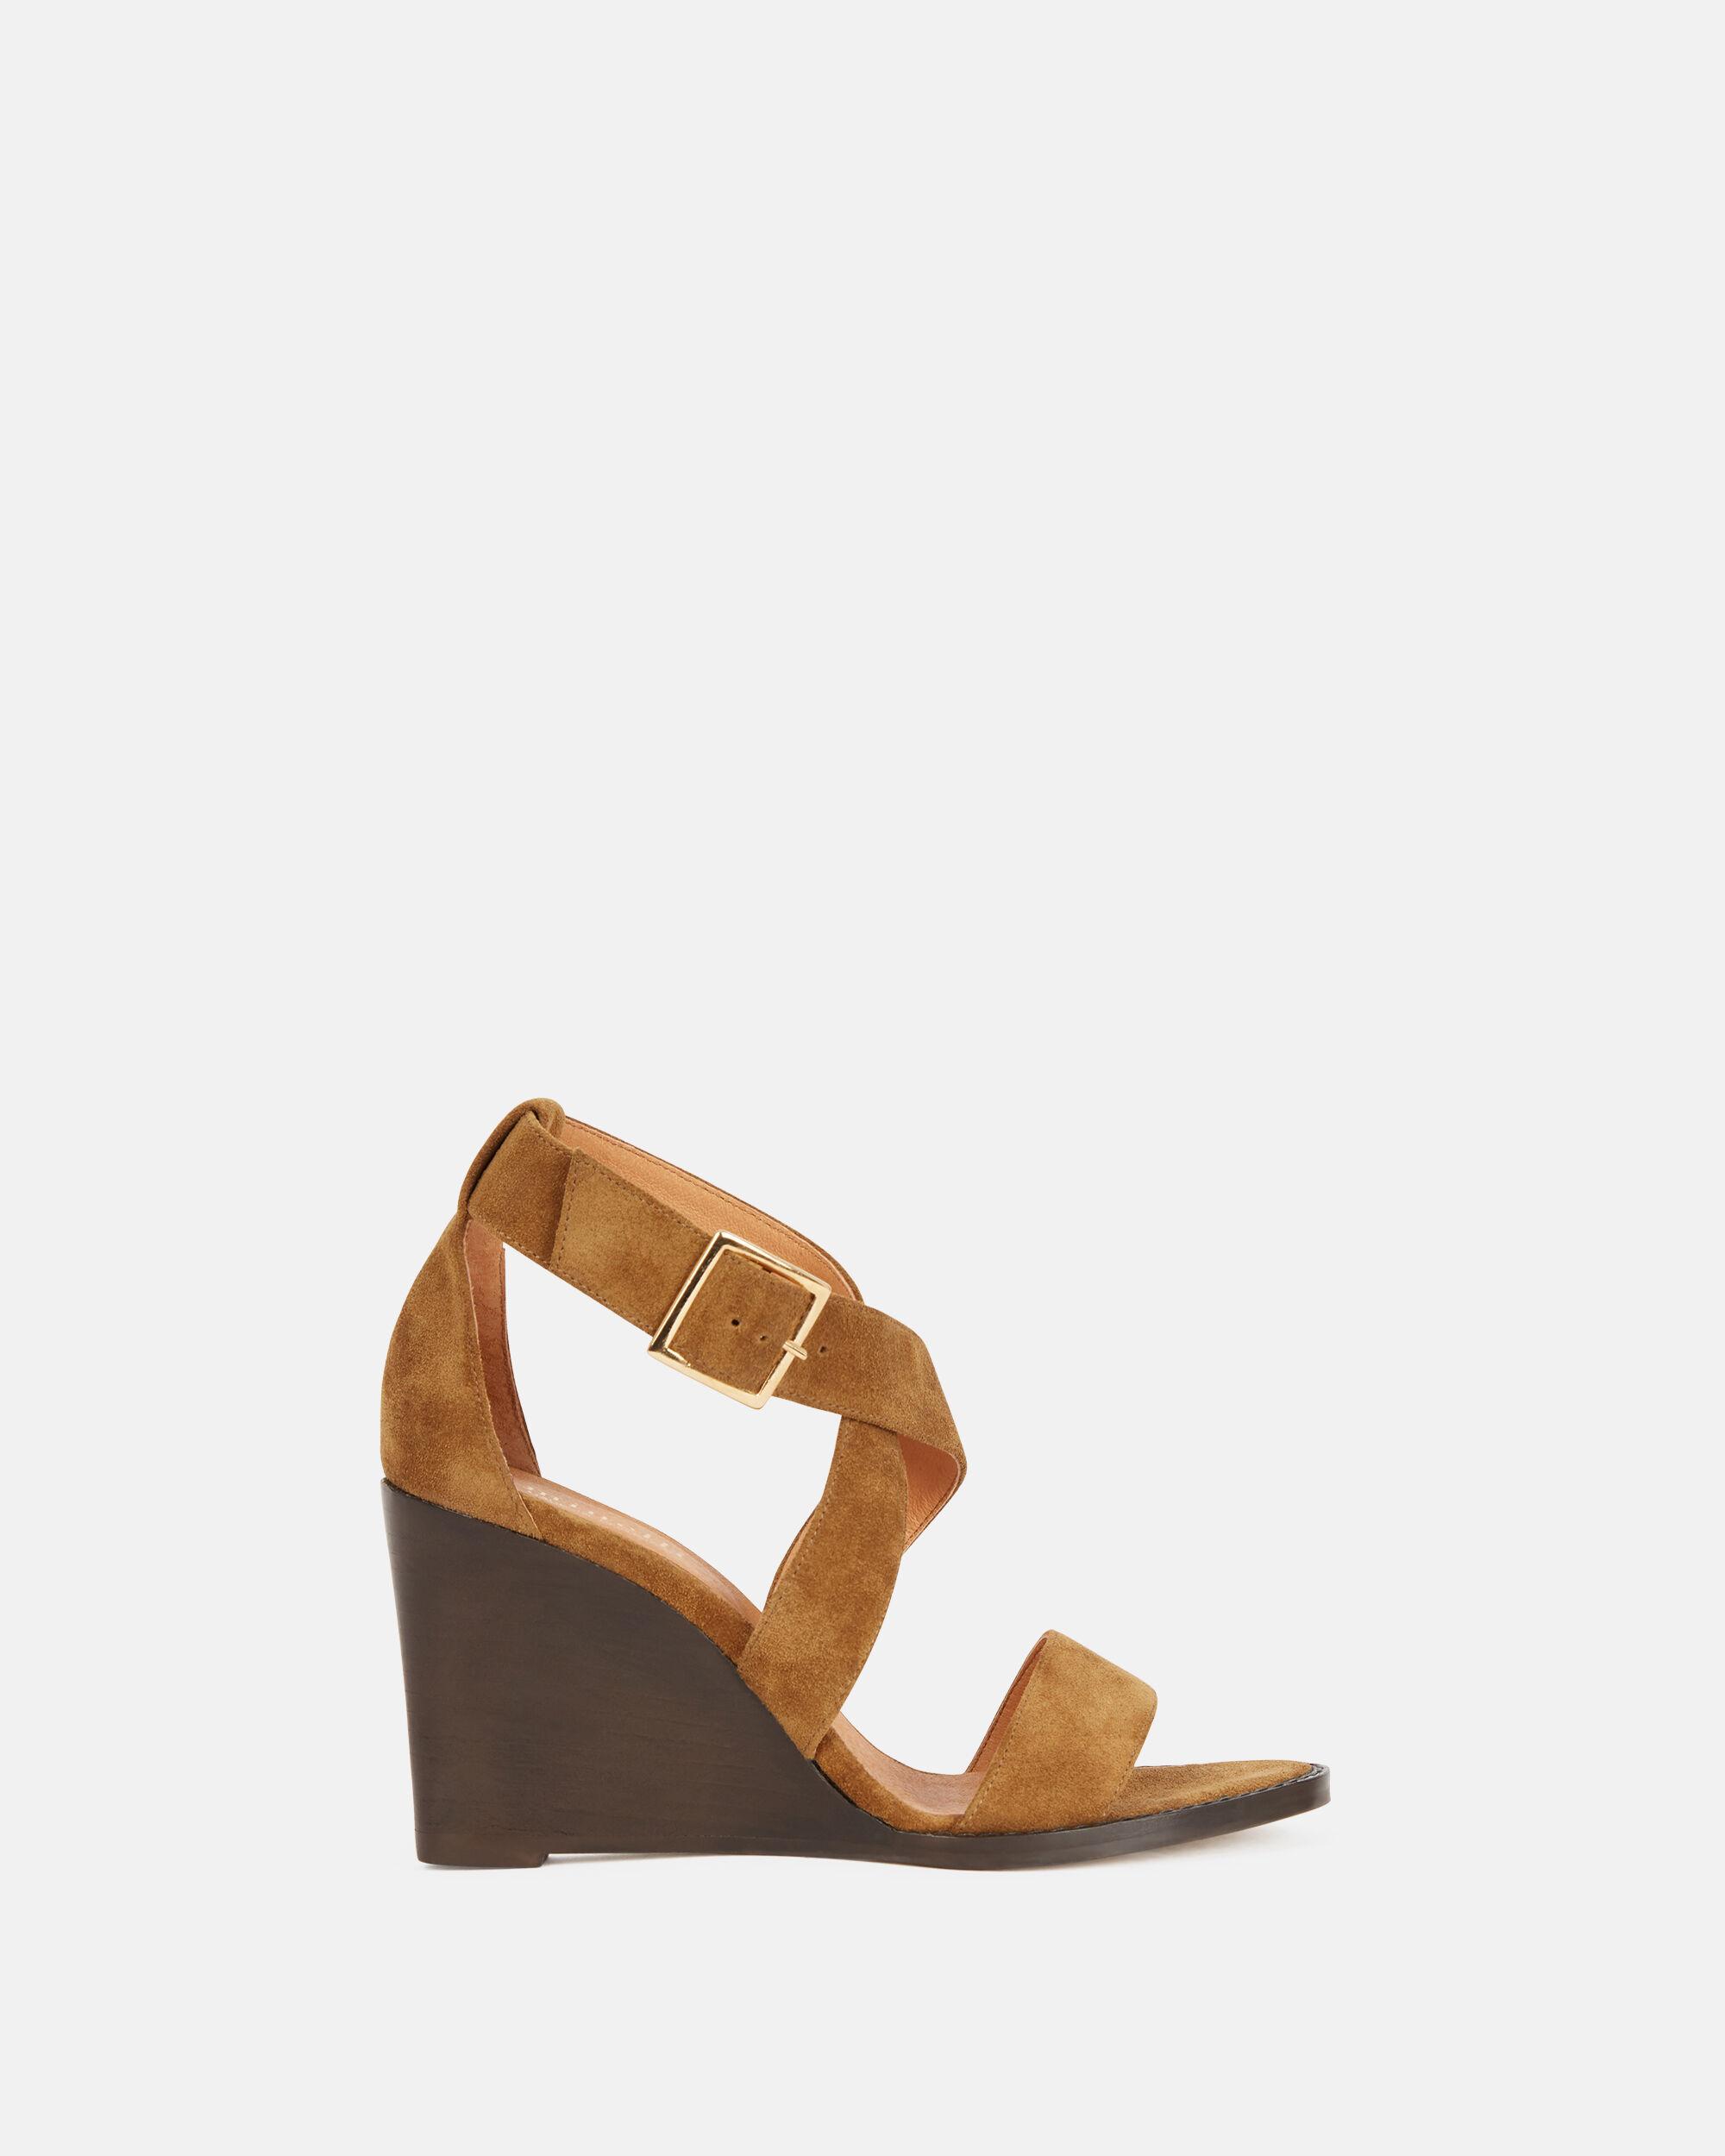 Chaussures Femme : chaussures tendance pour femmes   Minelli